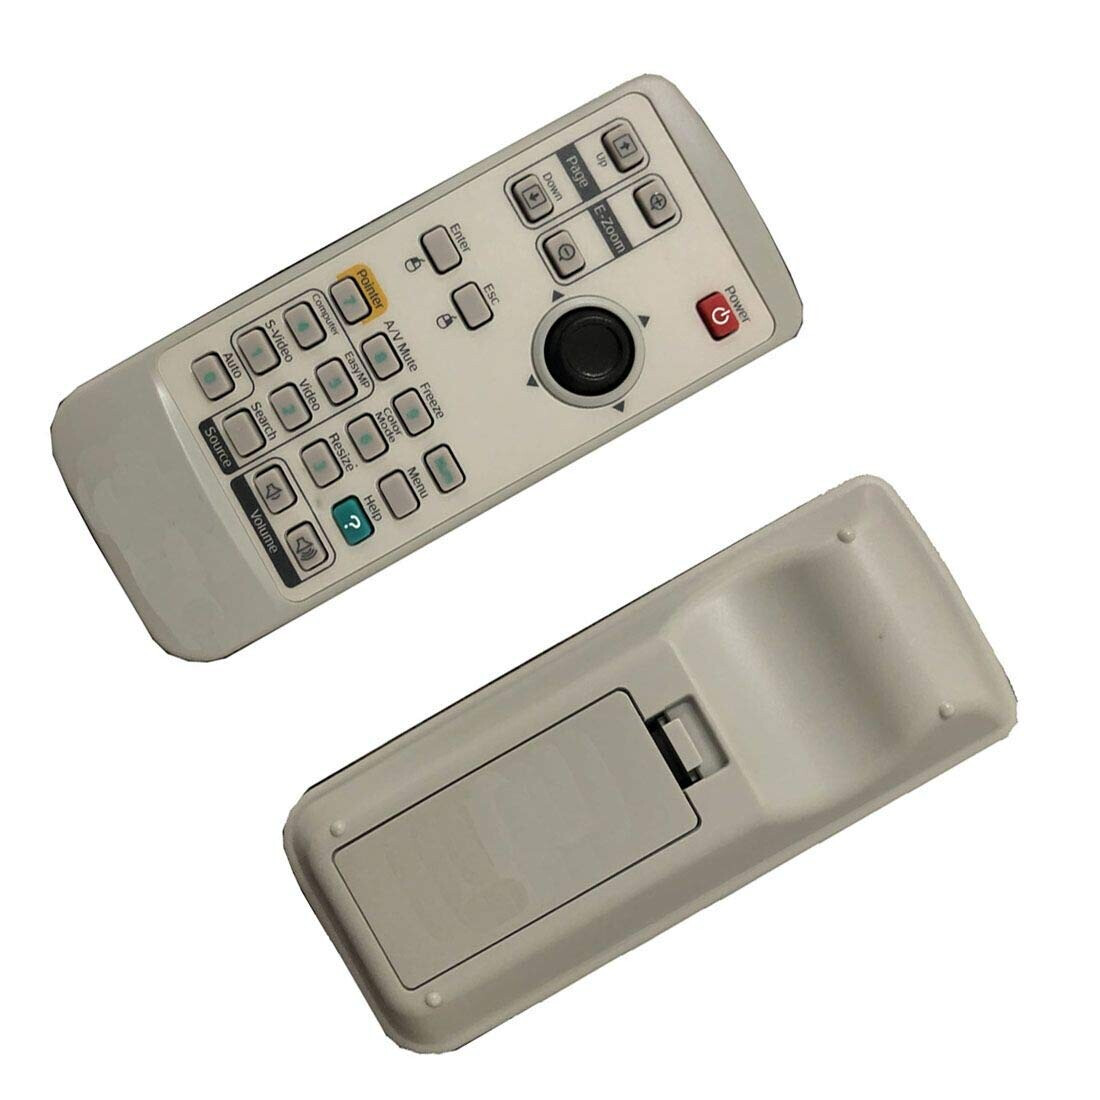 Télécommande de rechange pour Epson EB-1720, EB-1723, EB-1725, EB-1735W, EB-1730W